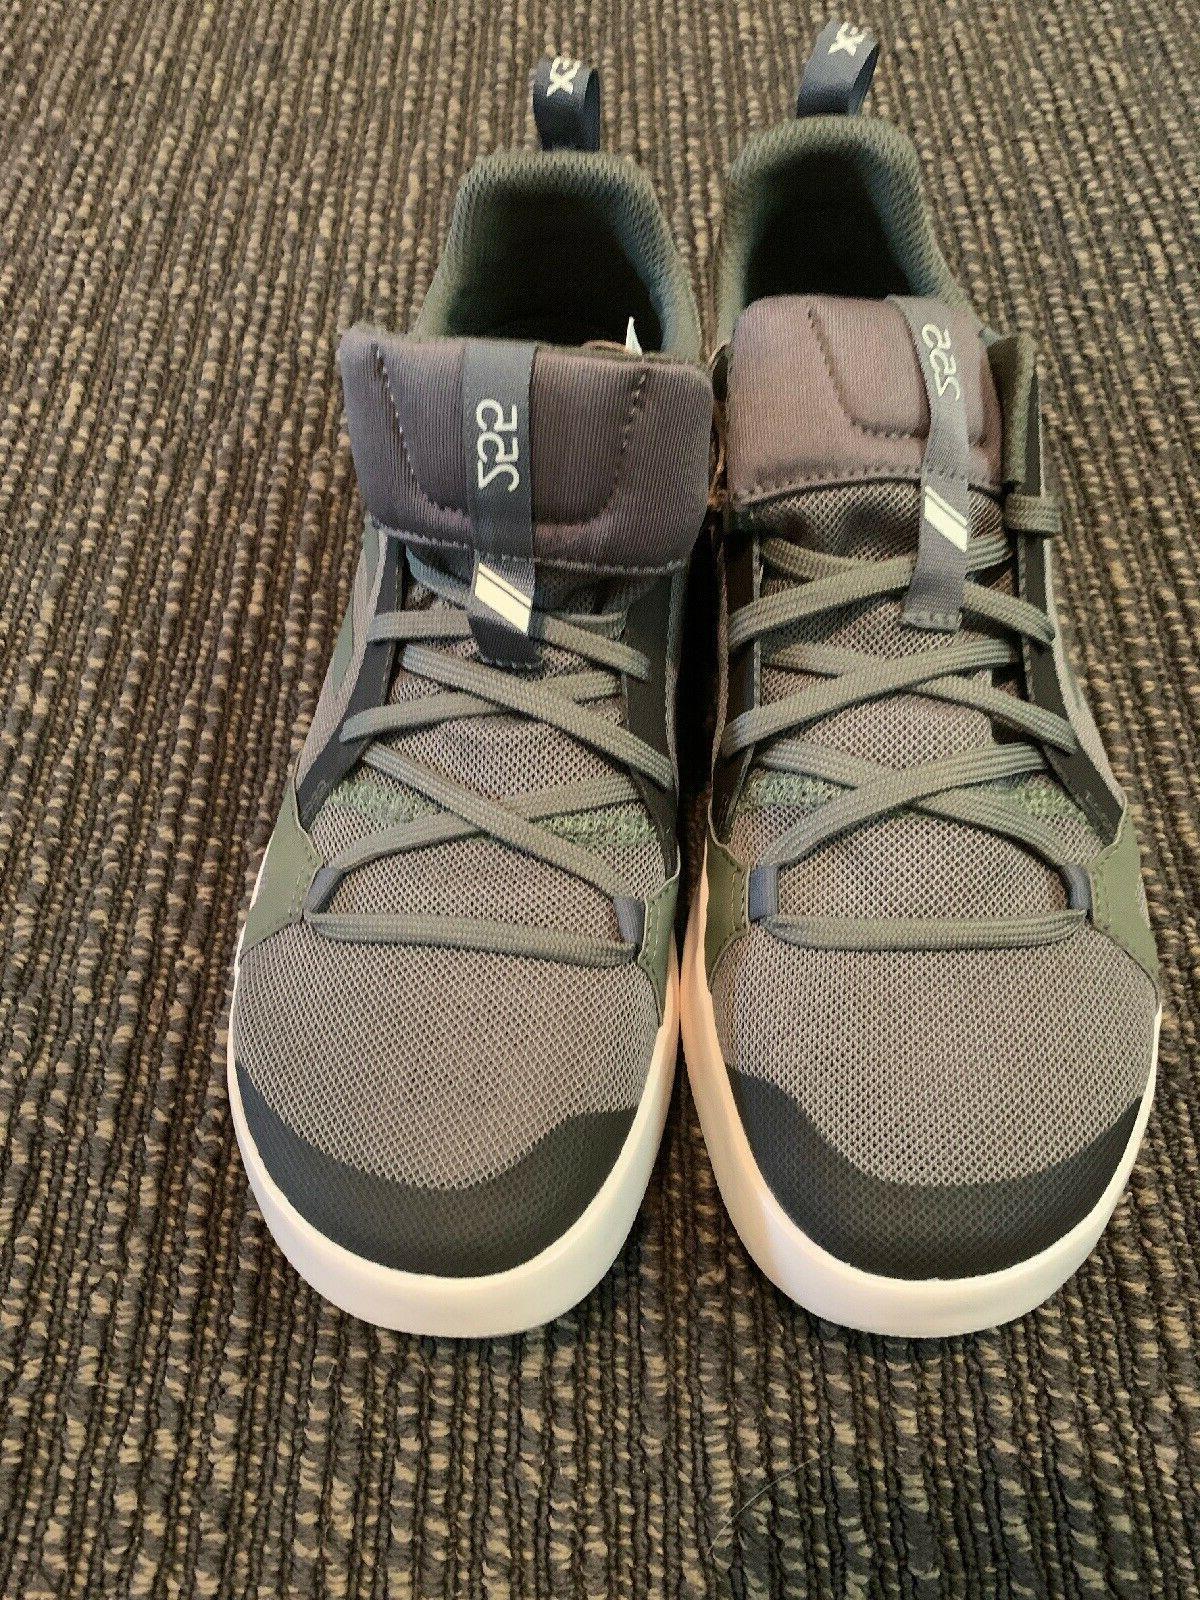 adidas boat shoes Men's size